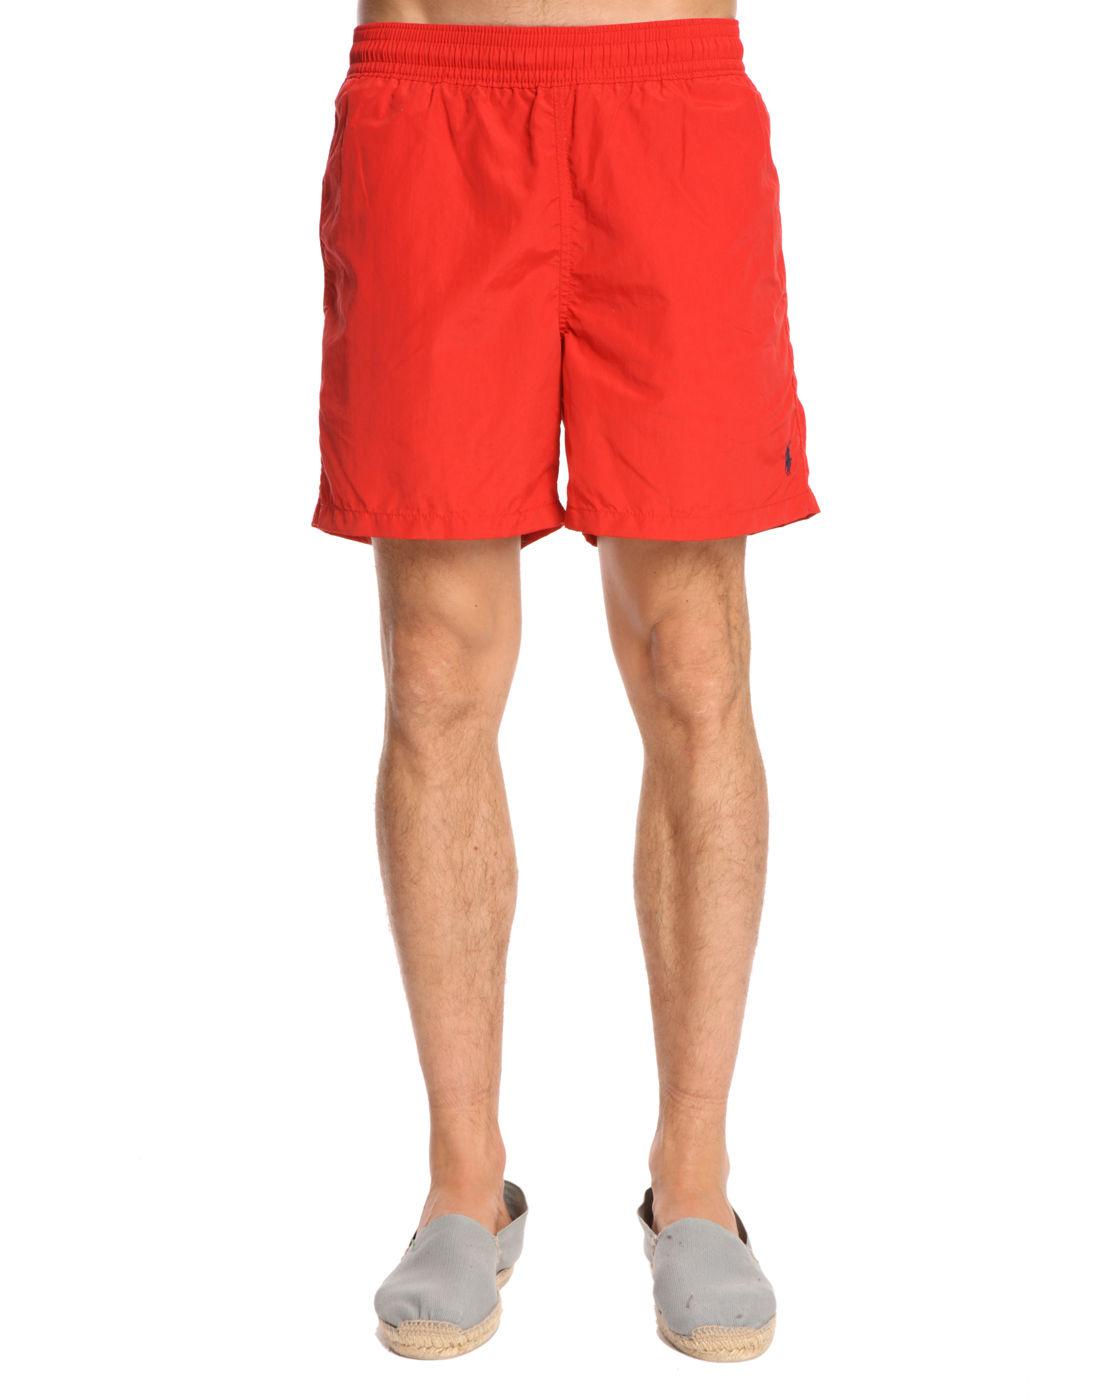 Red Polo Sweatpants Polo Ralph Lauren Hawaiian Red